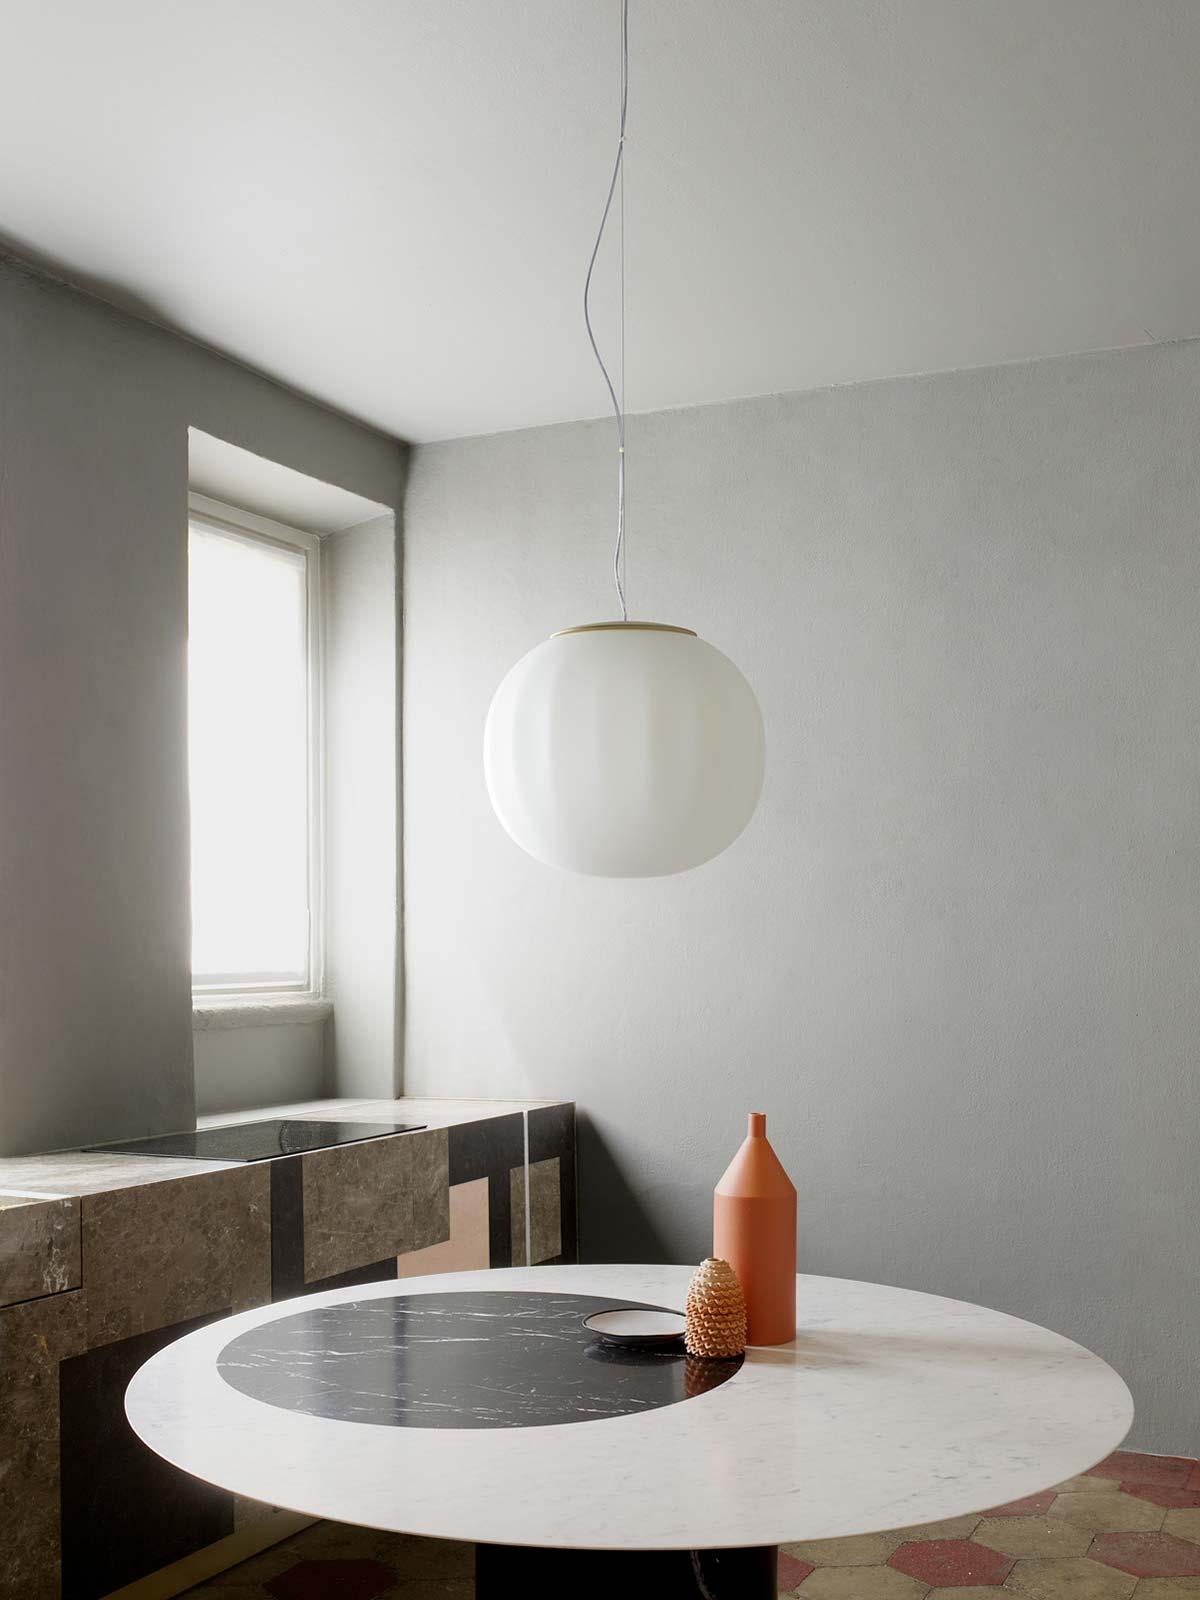 Lampada a sospensione Lita by Luceplan - Design David Dolcini